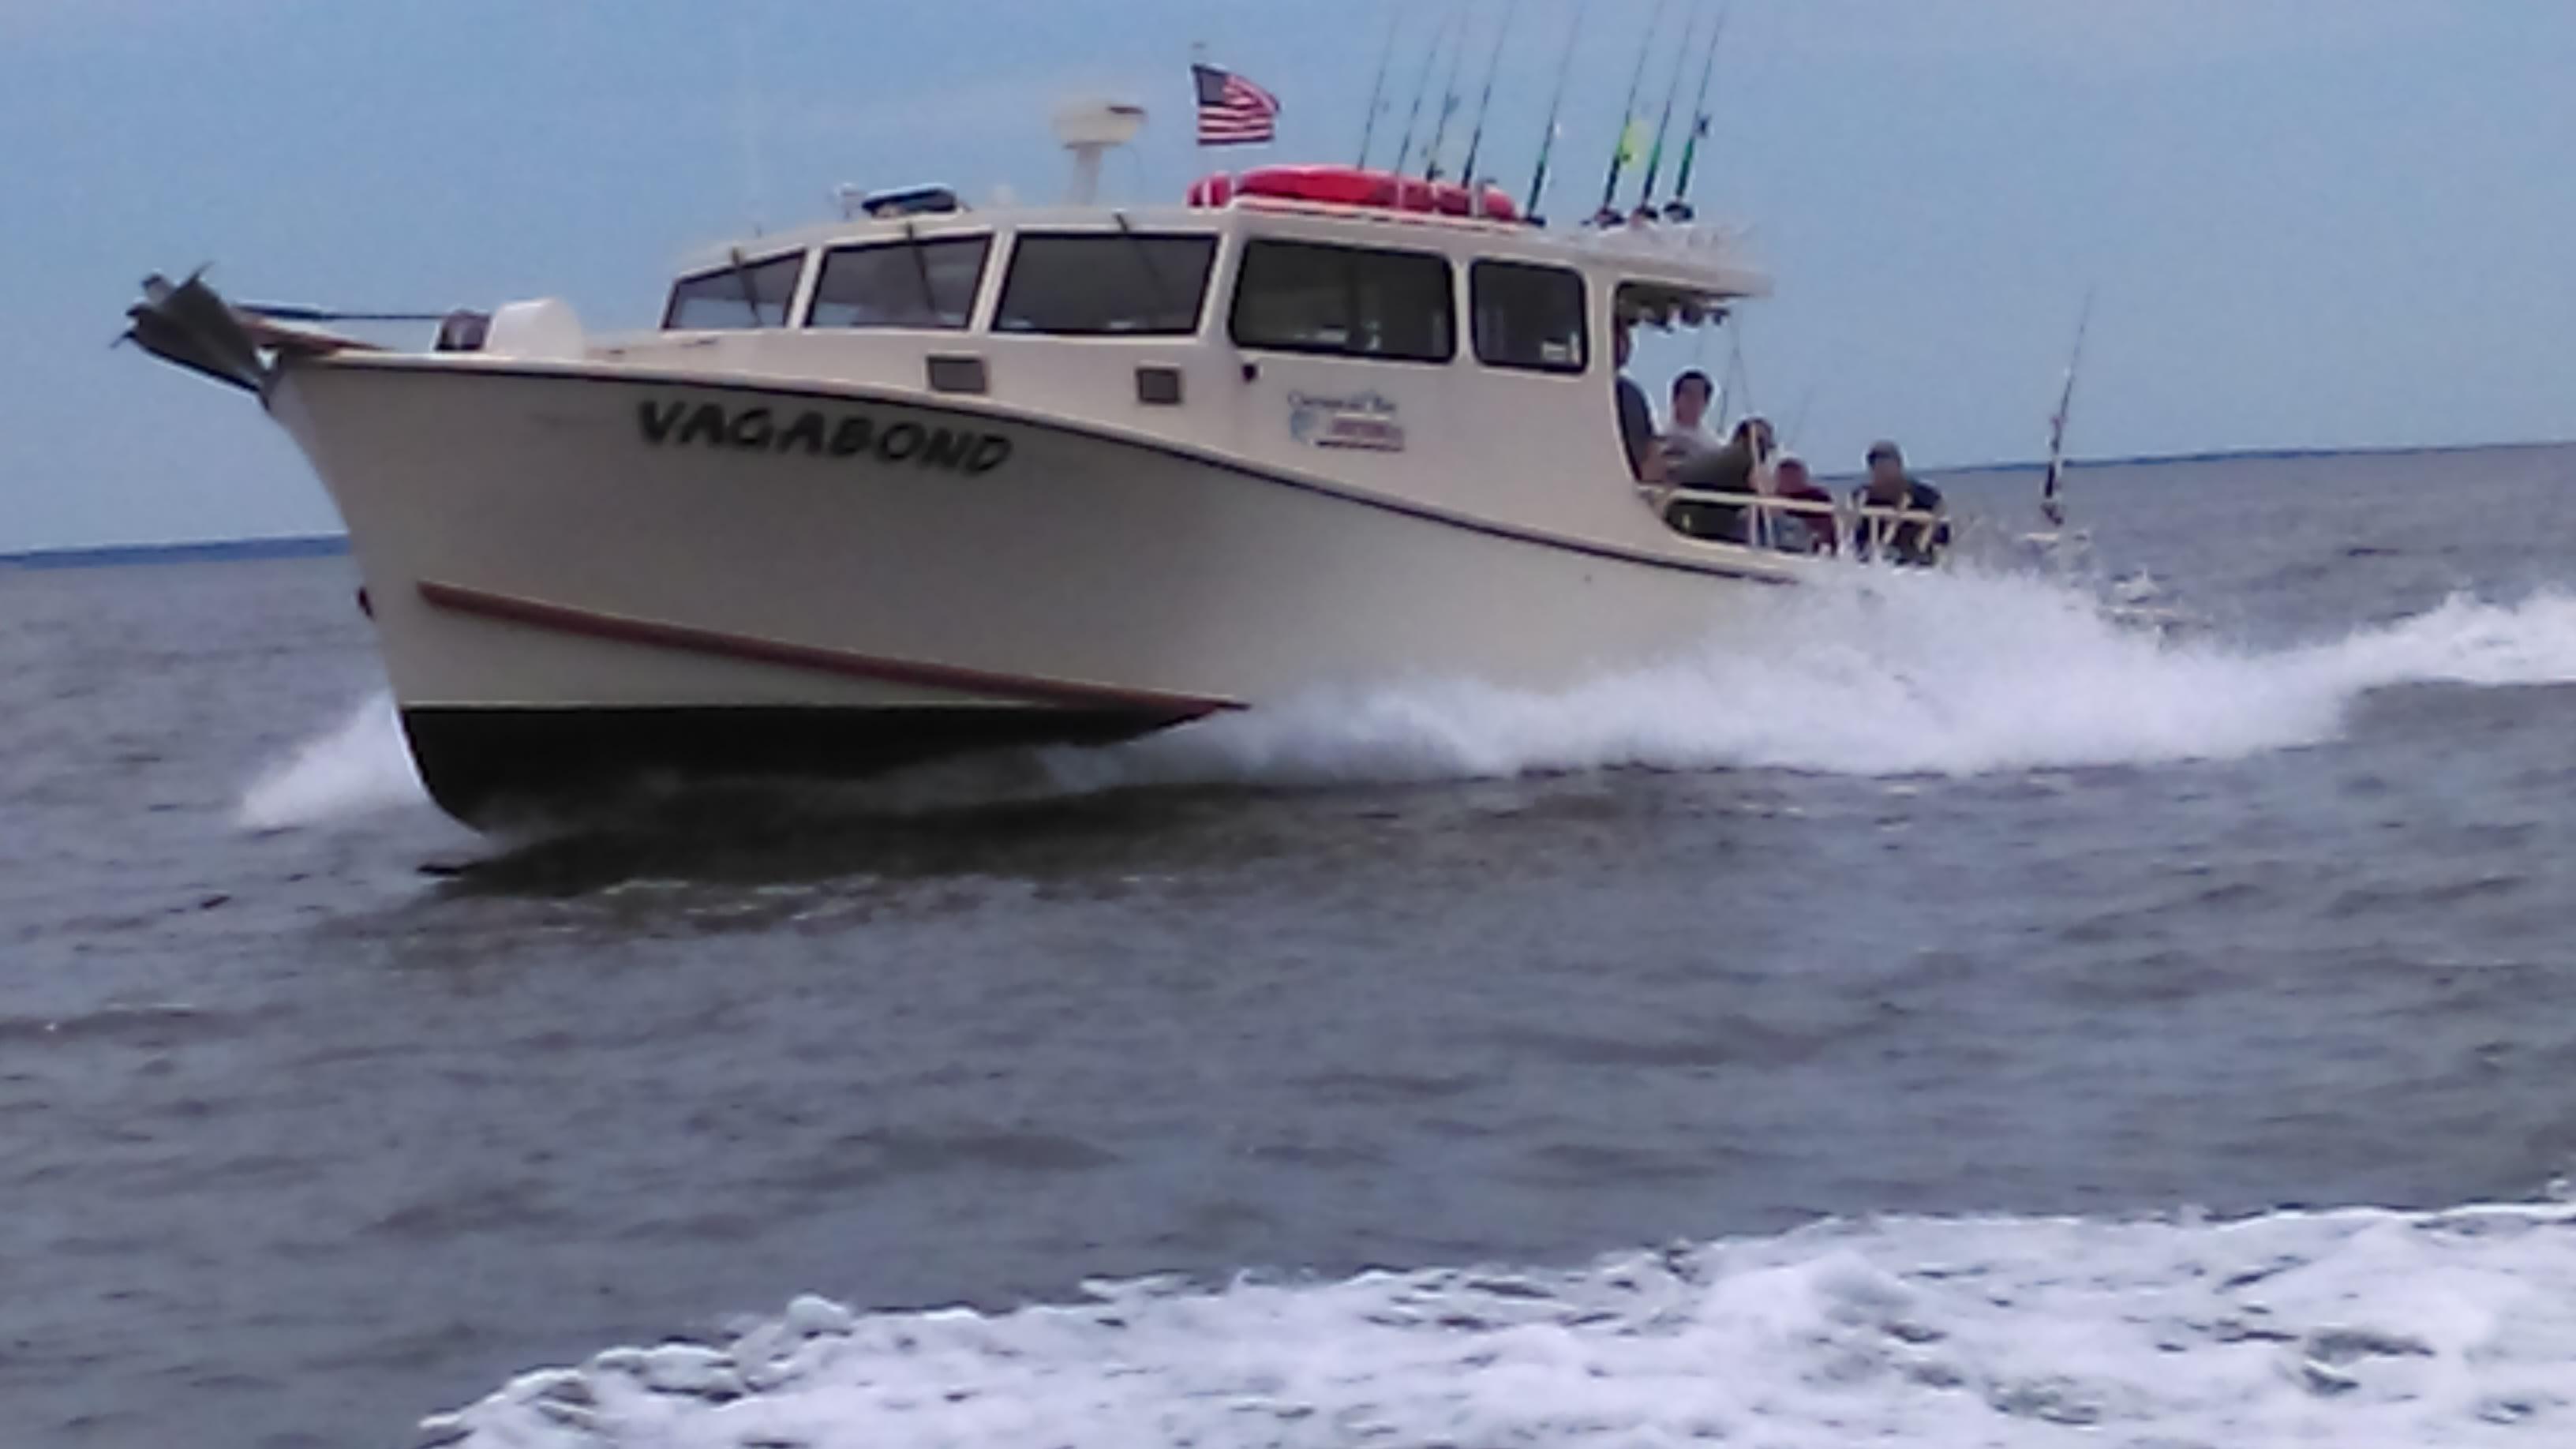 Chesapeake Bay Sport Fishing Charters: Vagabond